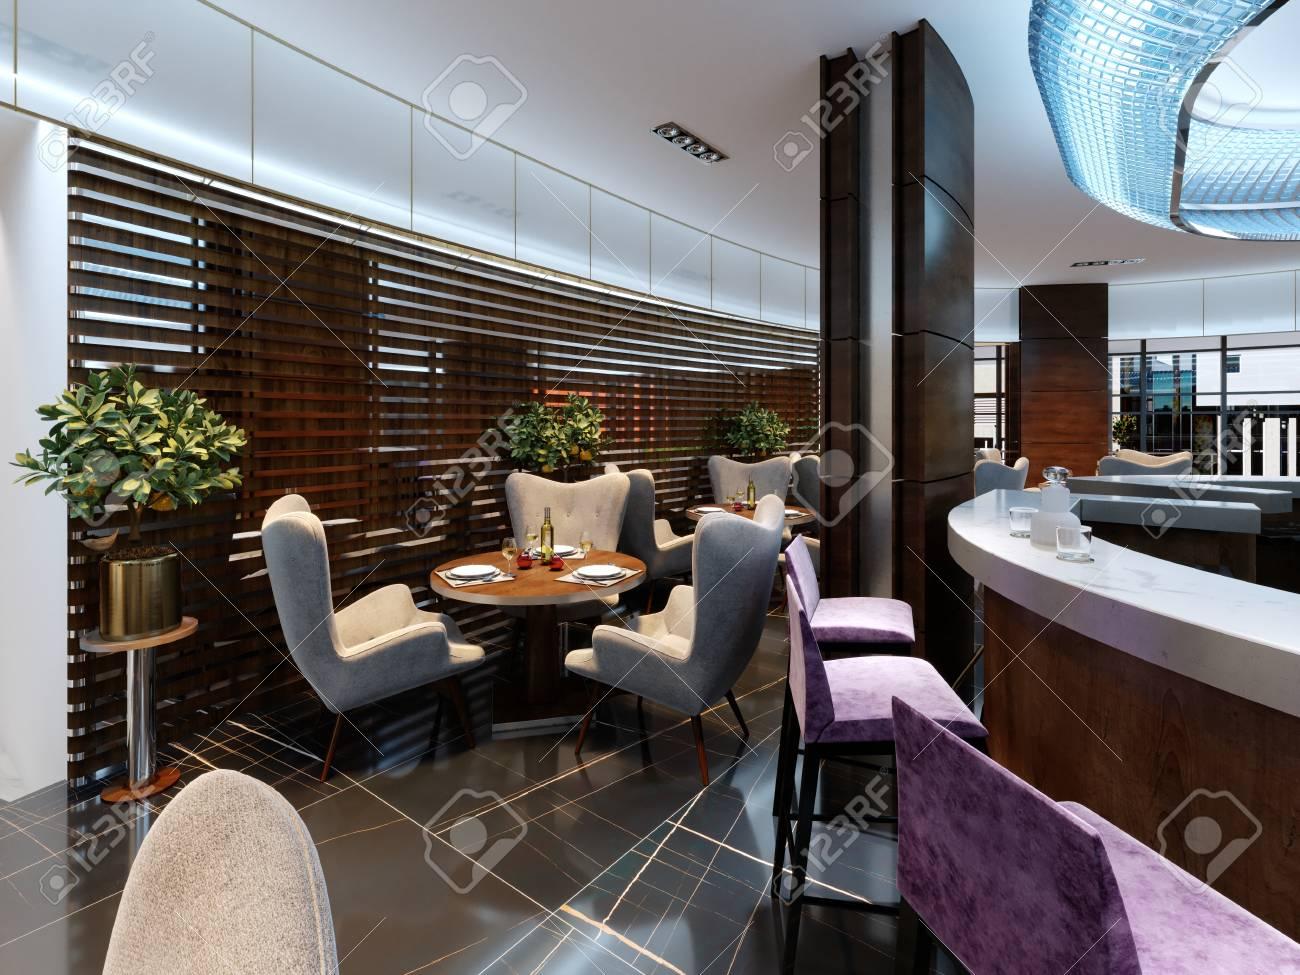 Modern Bar And Restaurant Interior Part Of A Hotel Designer